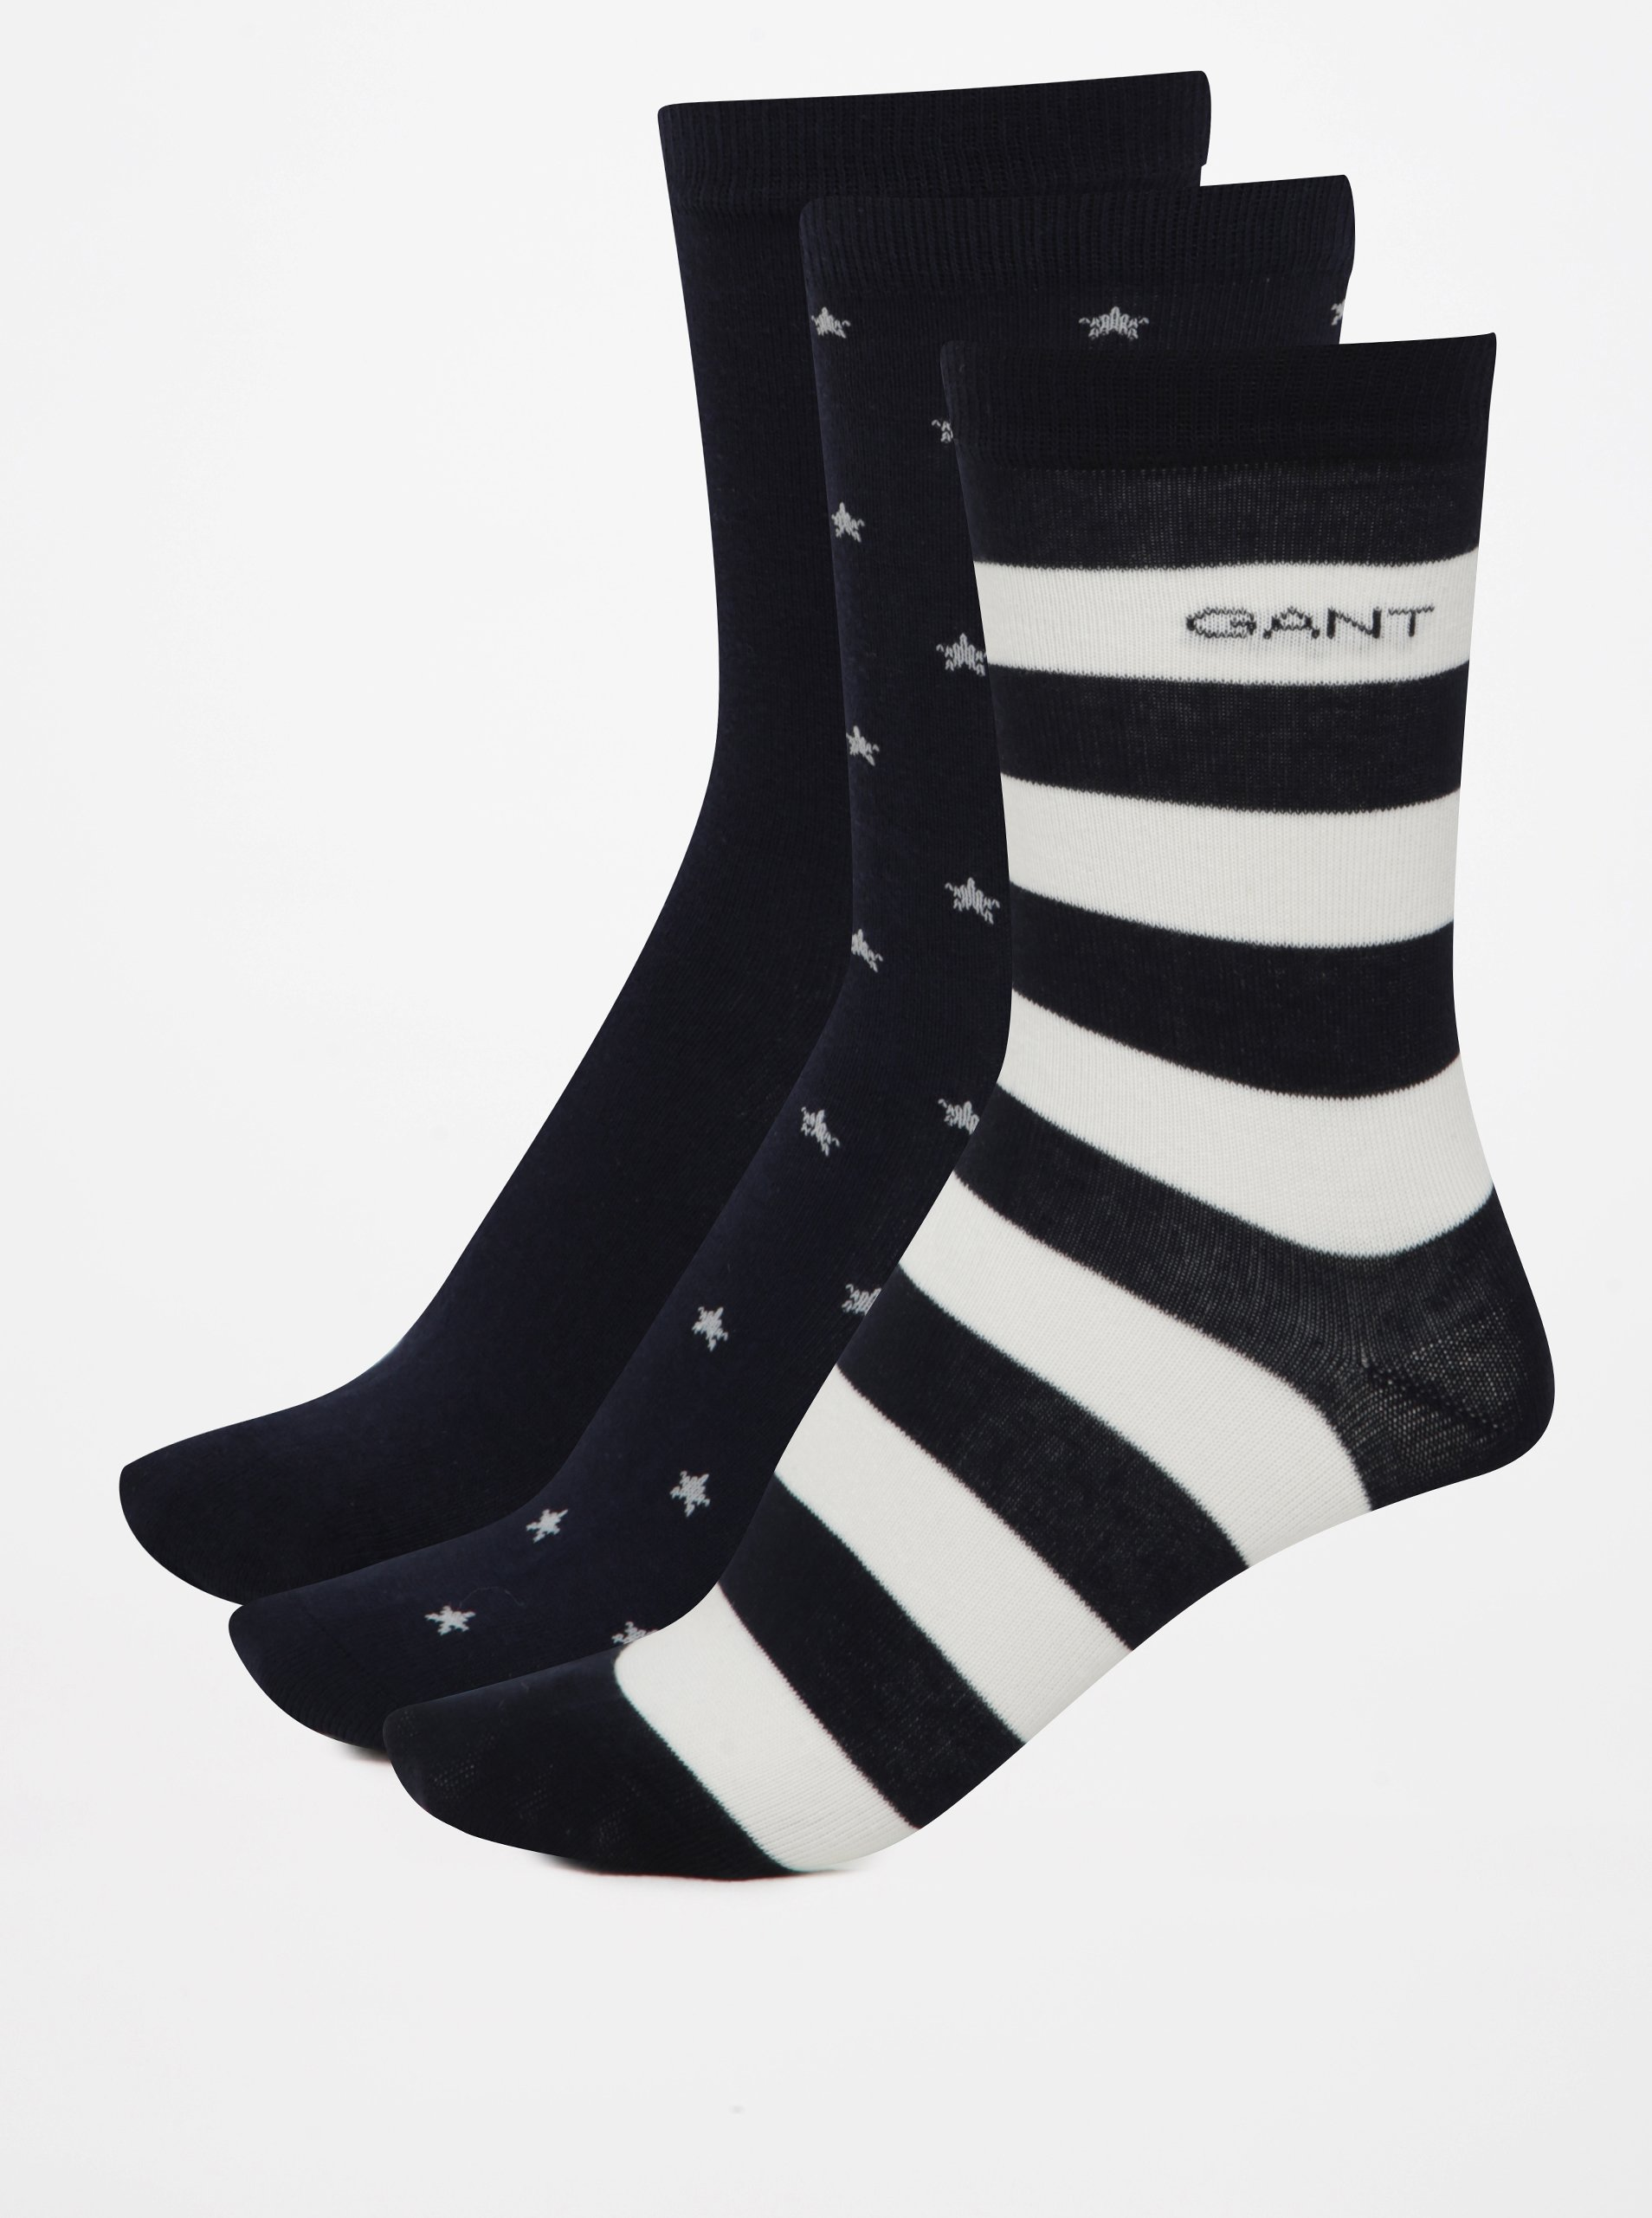 Sada tří párů tmavě modrých dámských vzorovaných ponožek GANT